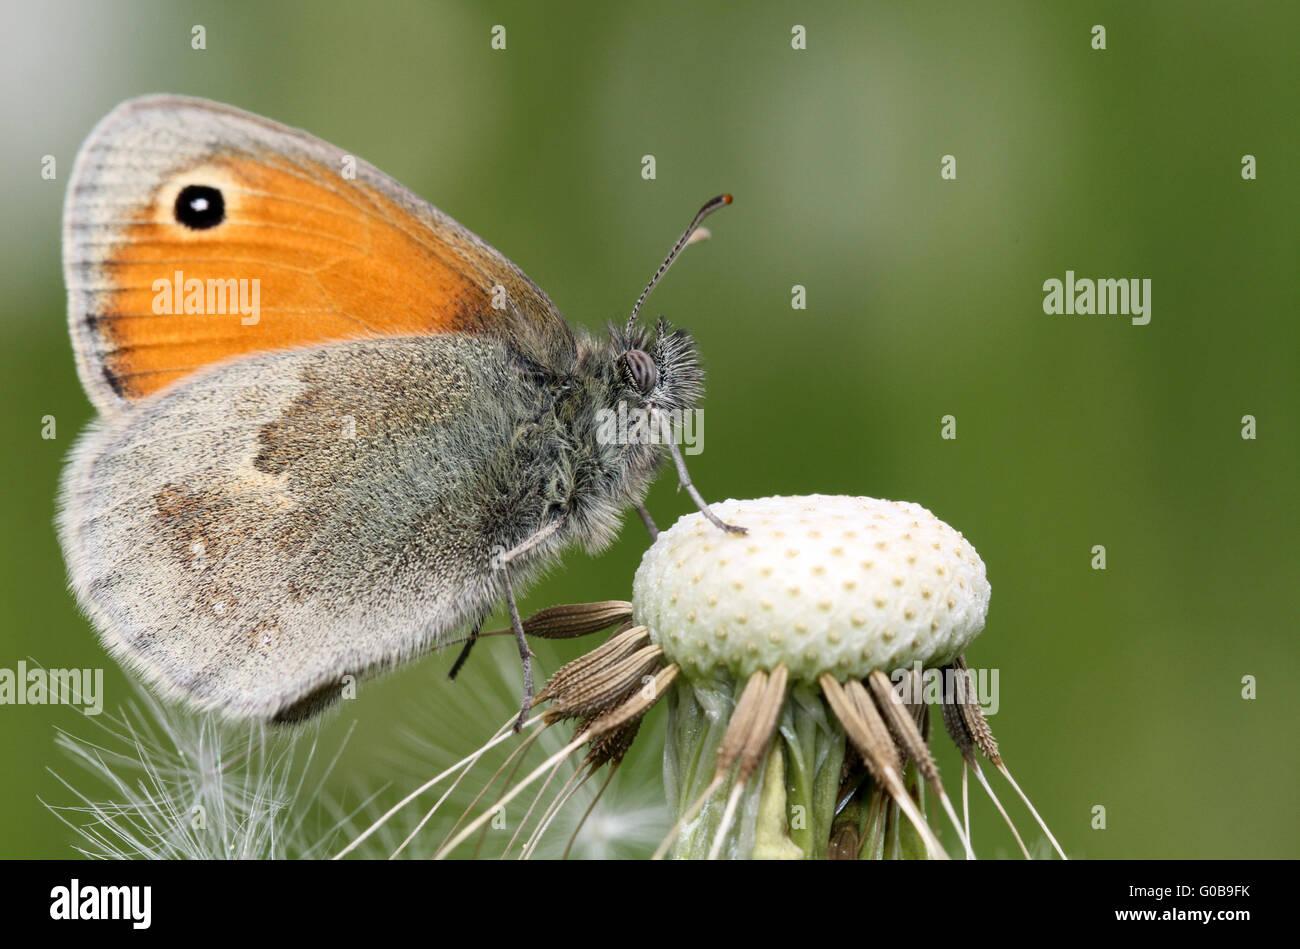 Coenonympha pamphilus - Stock Image